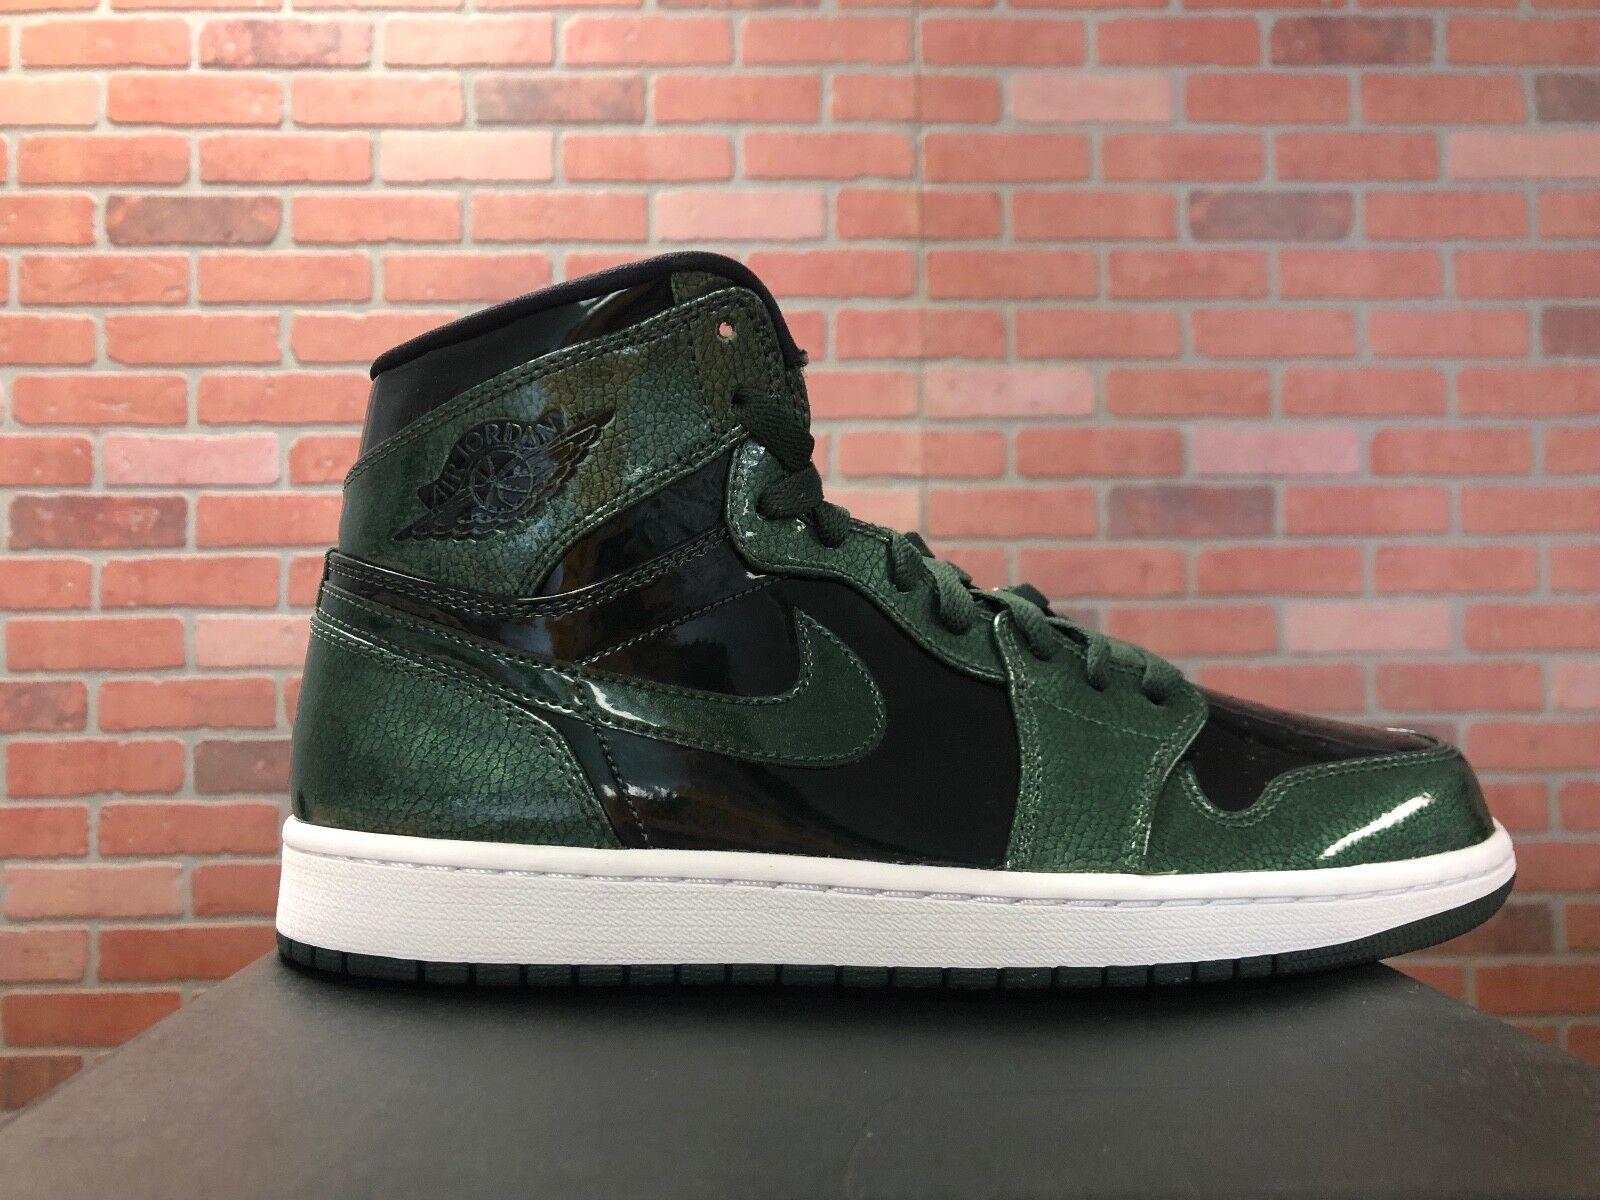 Jordan 1 Retro Grove verde Nuevo Ds 332550 300